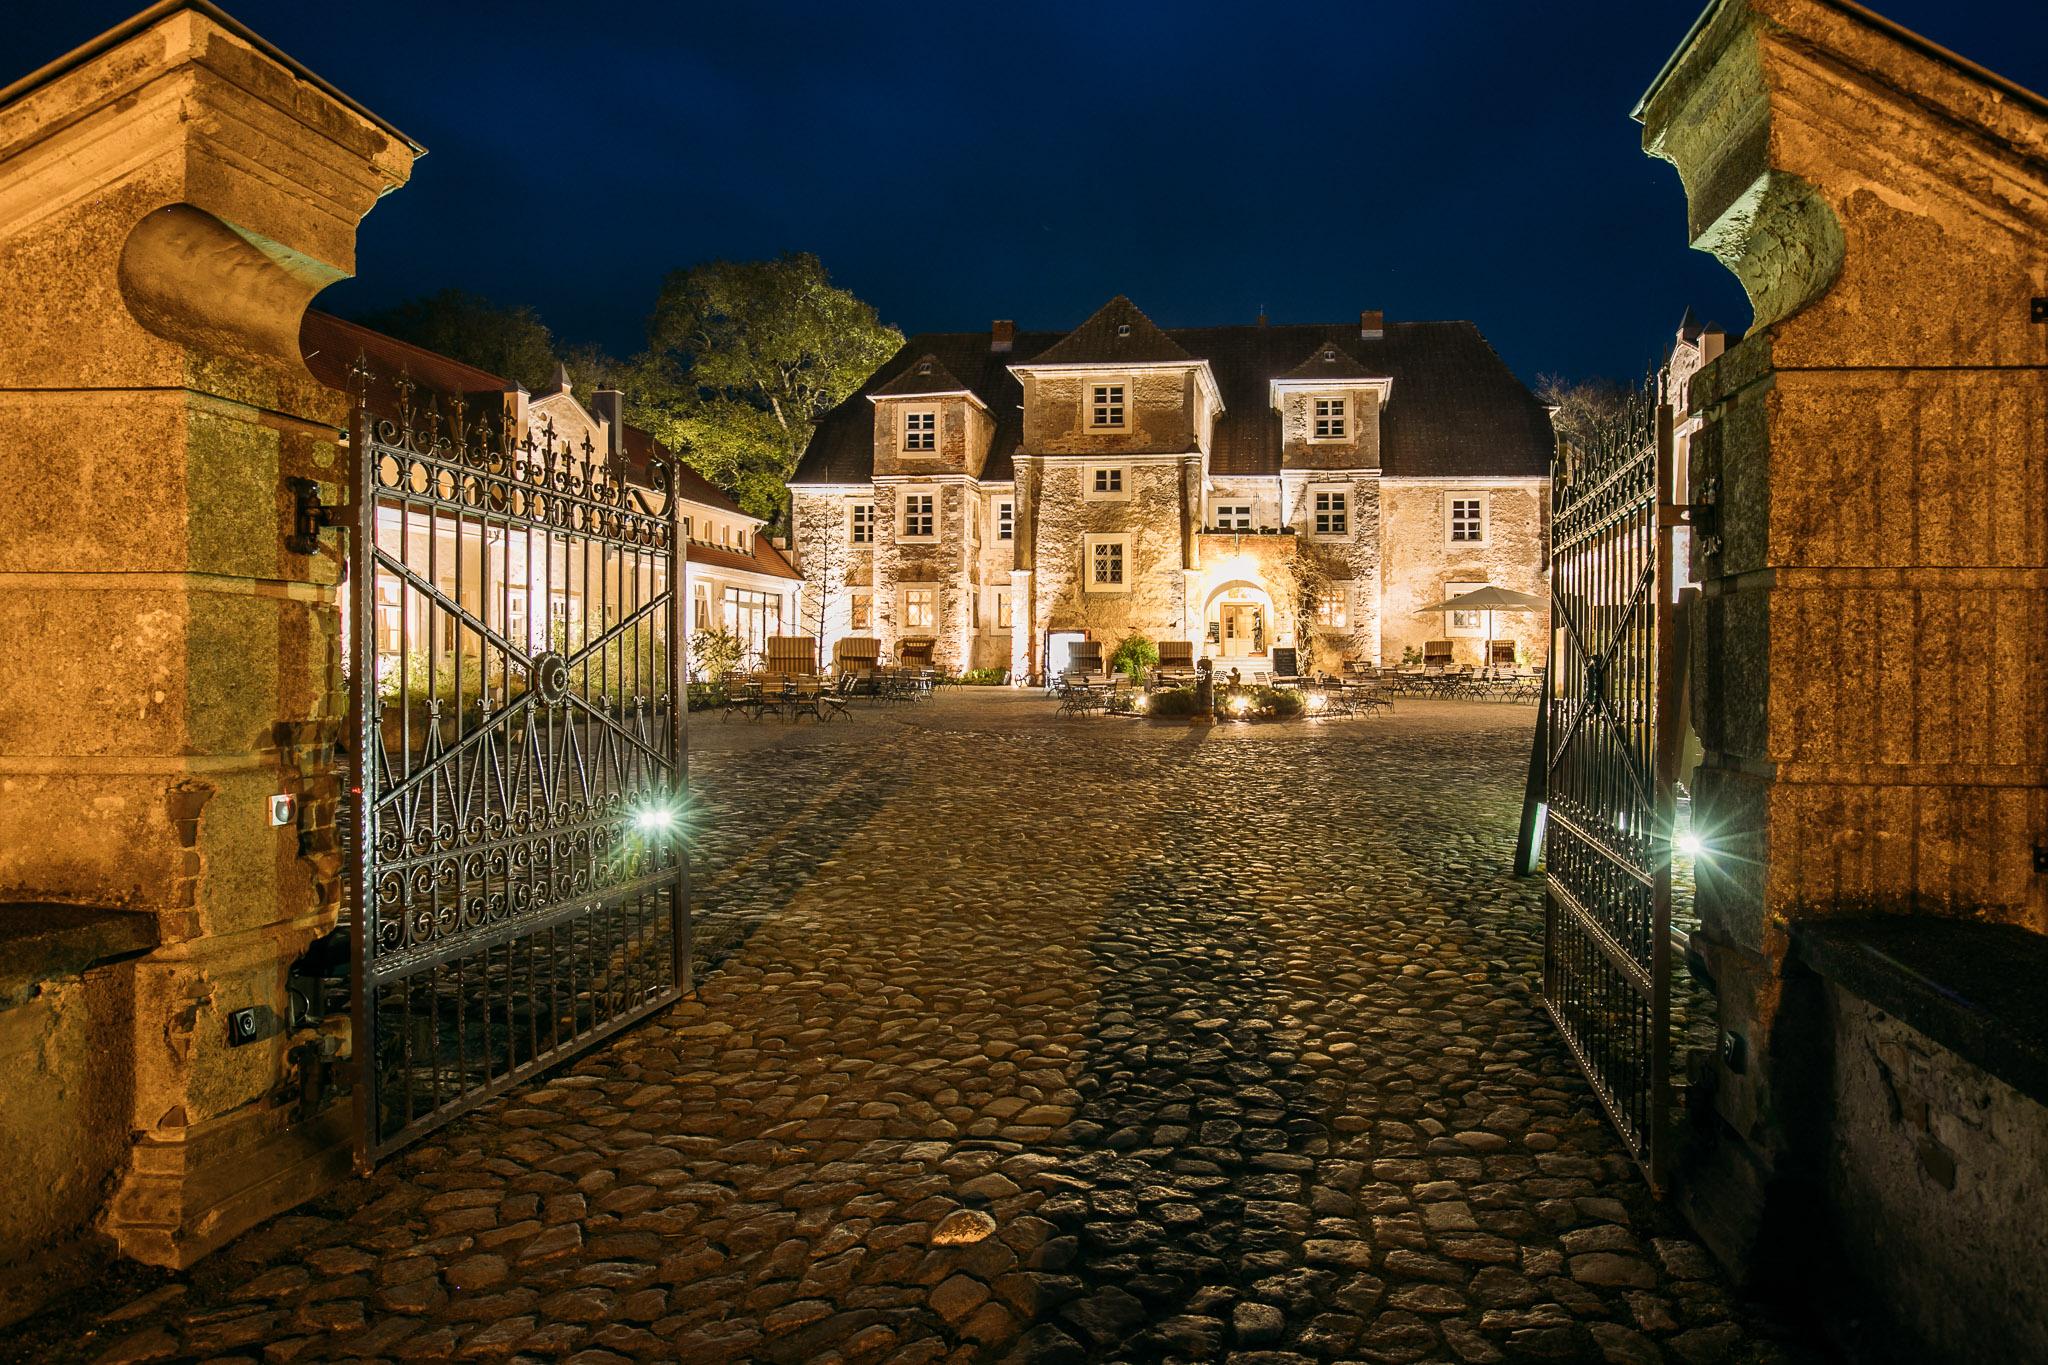 Hochzeit Usedom Ostsee Schloss Mellenthin_Web_0001-2.jpg